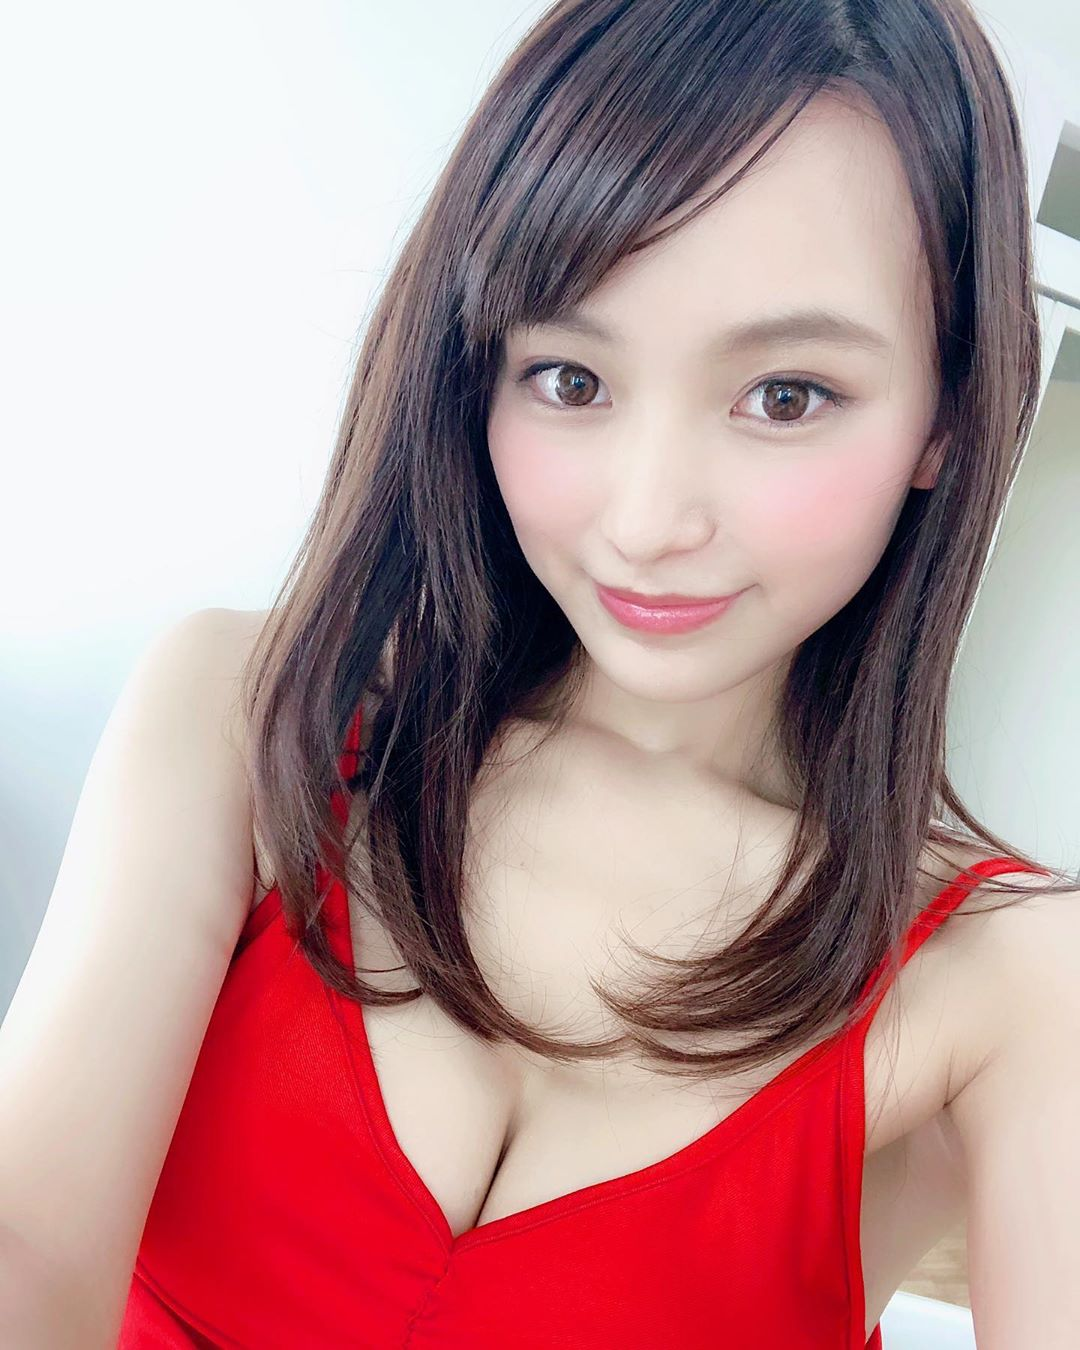 vsp8qb4T o - IG正妹—御寺雪 (御寺ゆき)